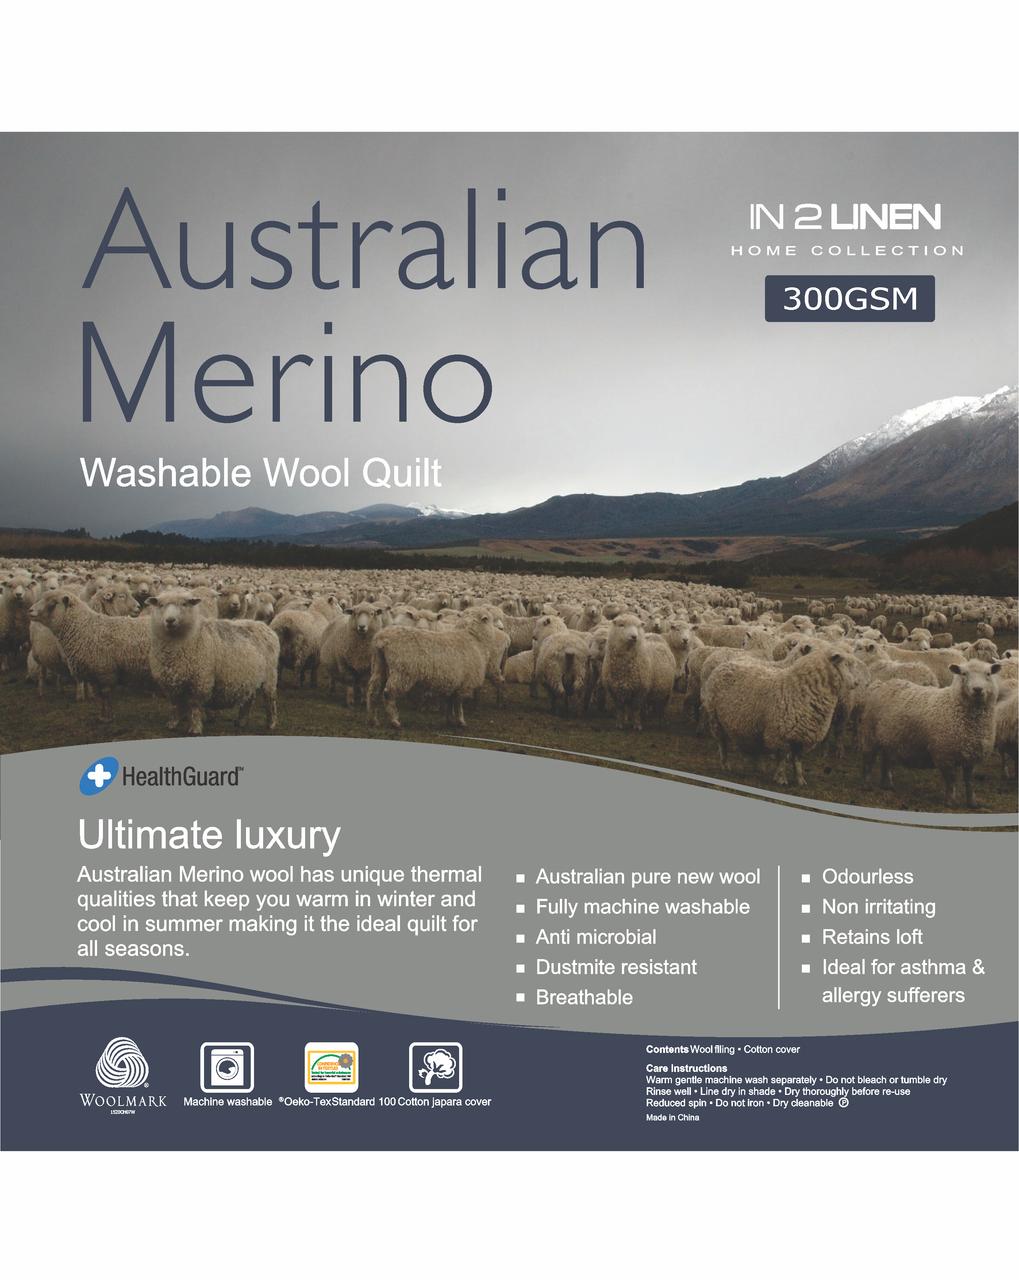 In 2 Linen Australian Merino Wool King Bed Quilt 300GSM | All seasons